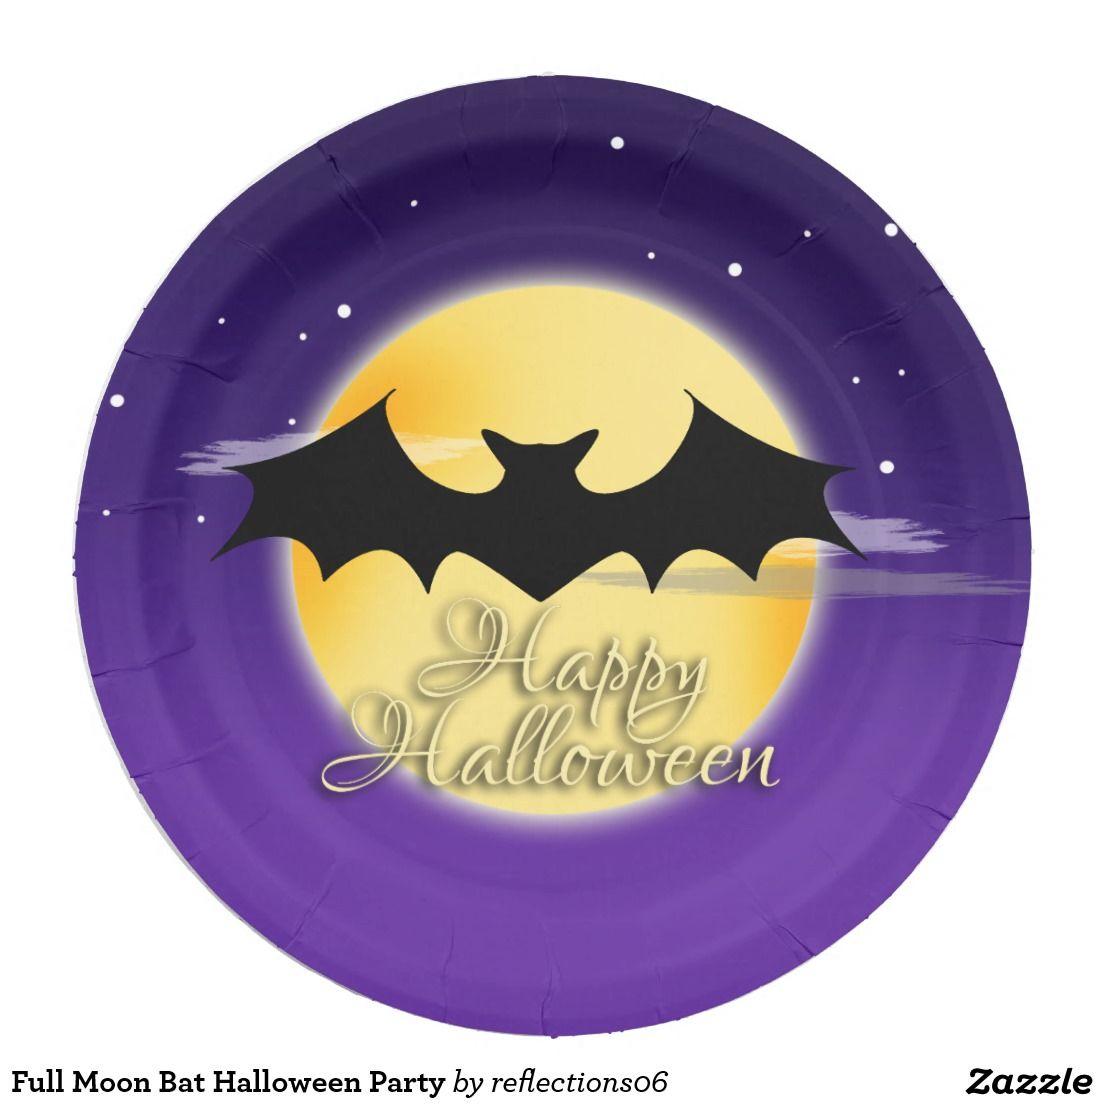 Full Moon Bat Halloween Party Paper Plate   Bats, Halloween party ...